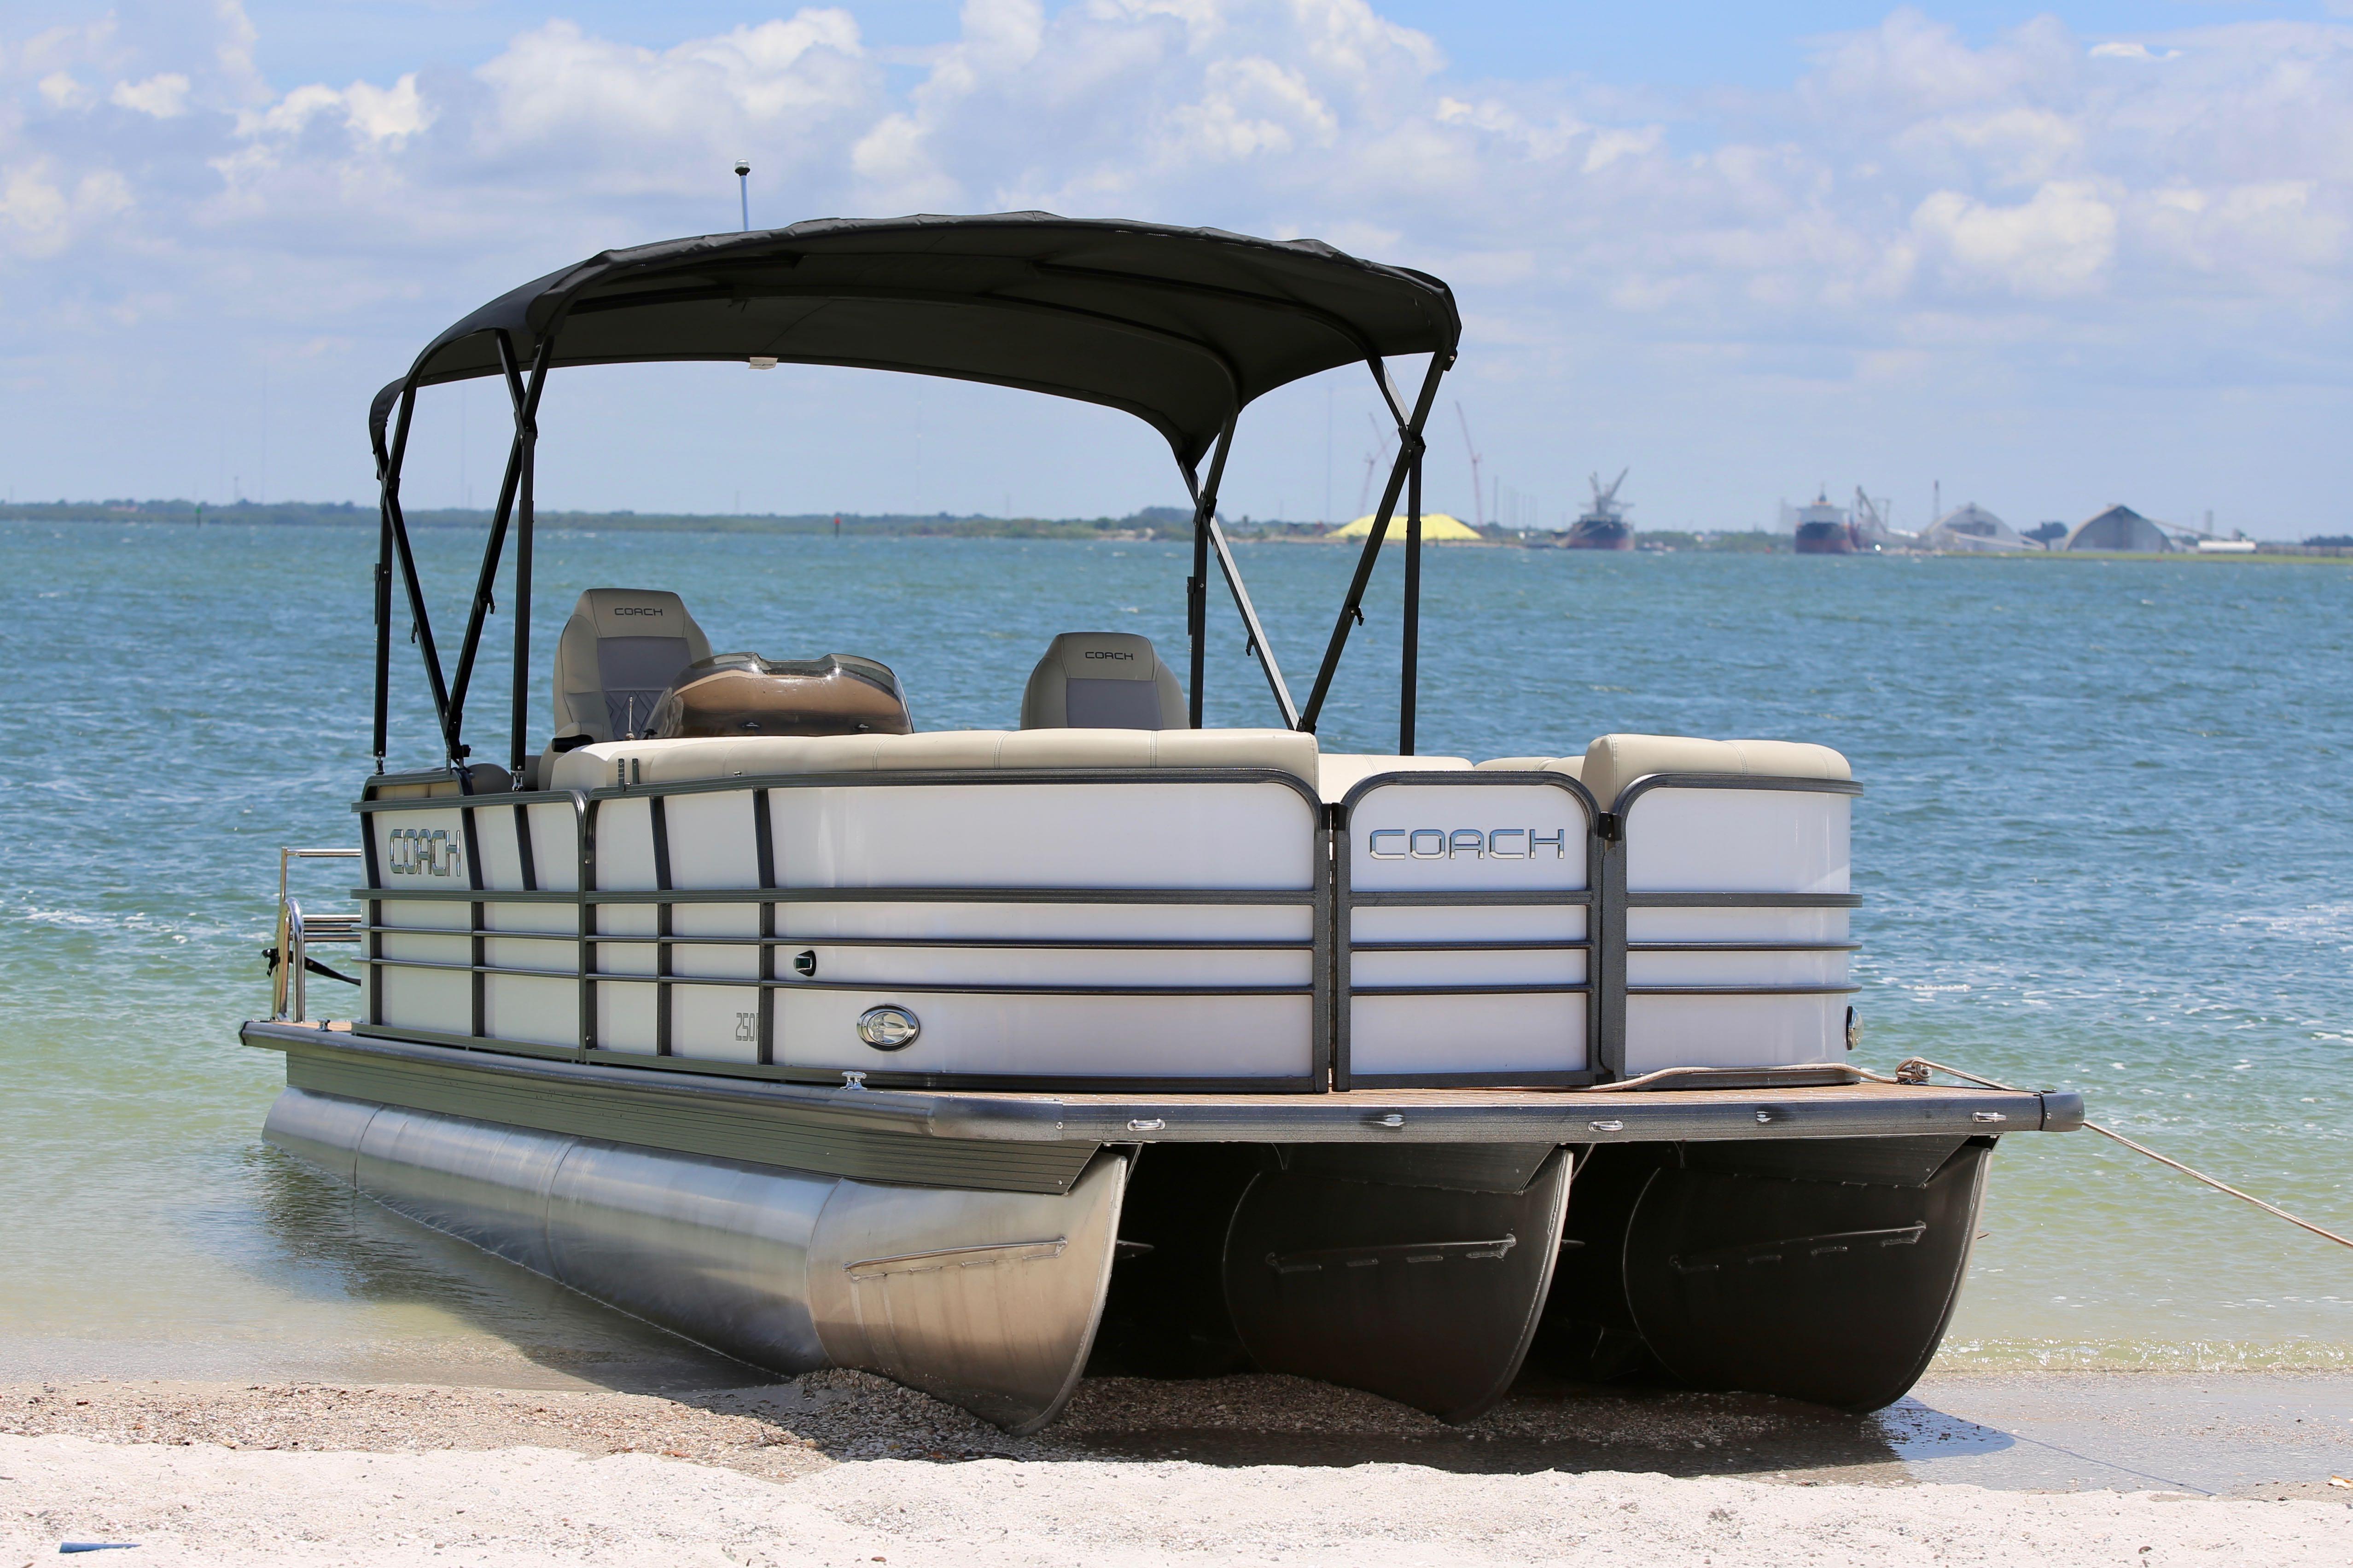 boat 2 - 1.jpg